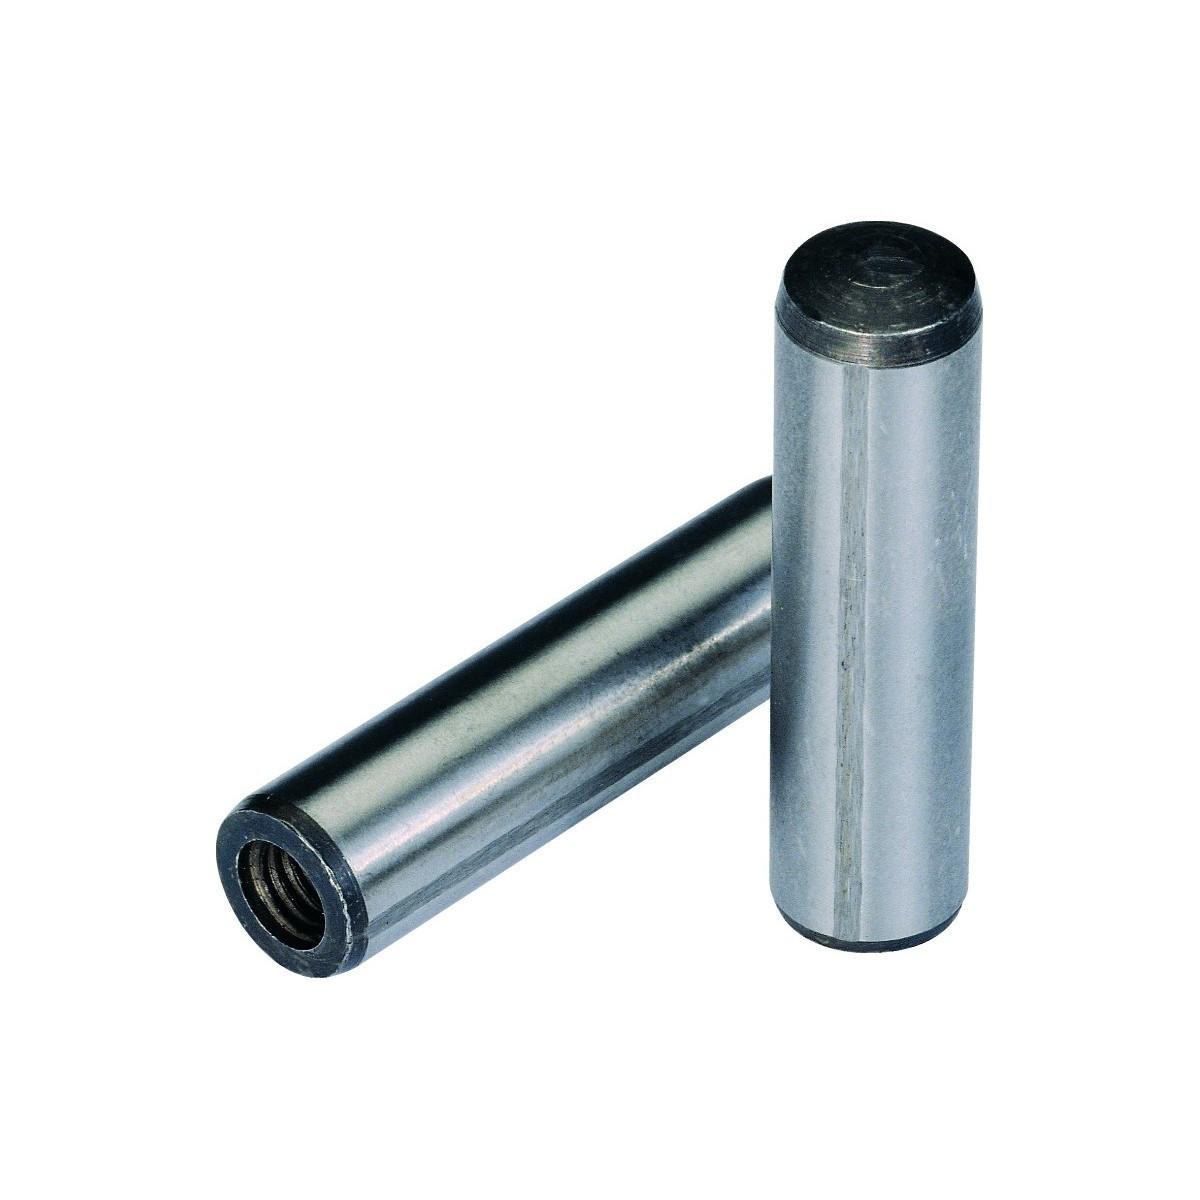 Штифт цилиндрический MMG  DIN 7979D M12 х 45 Класс 10.9 (Фосфат) 1 шт